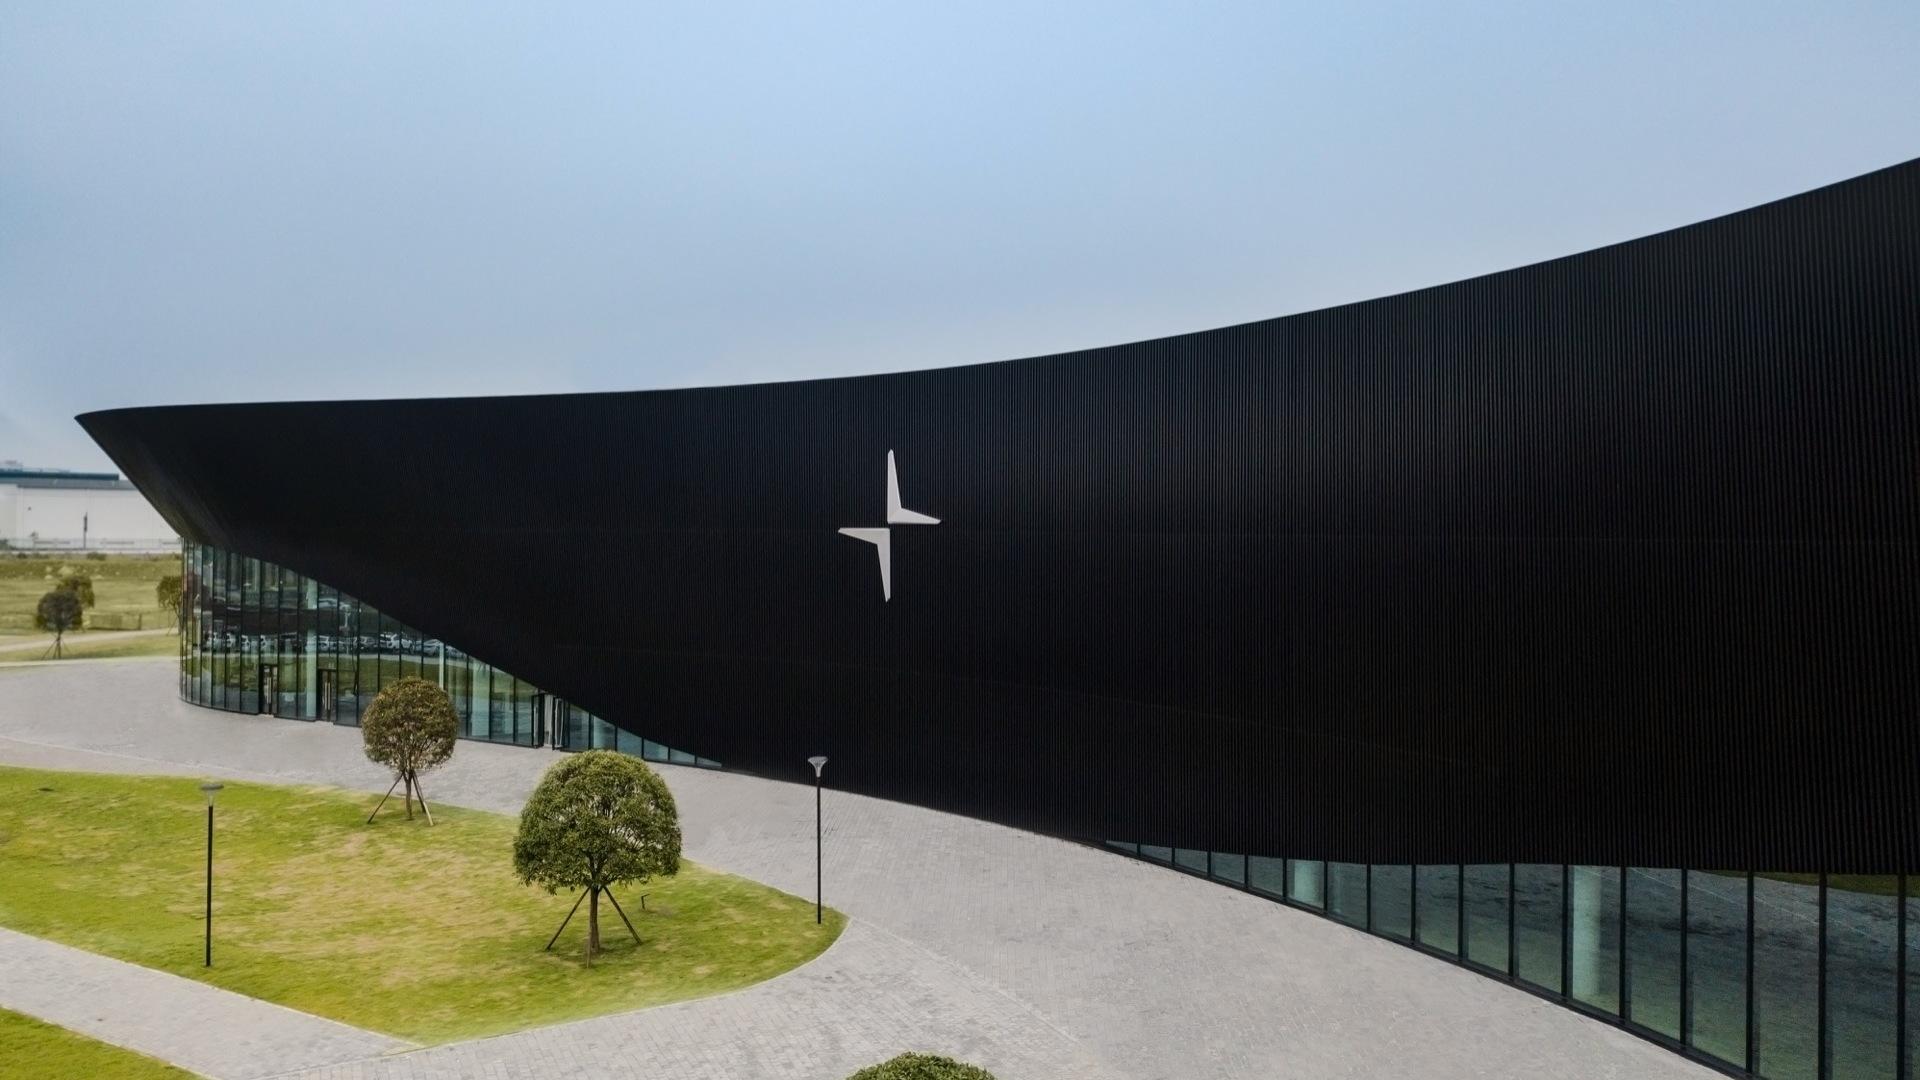 Polestar production facility and customer experience center  -  Chengdu, China